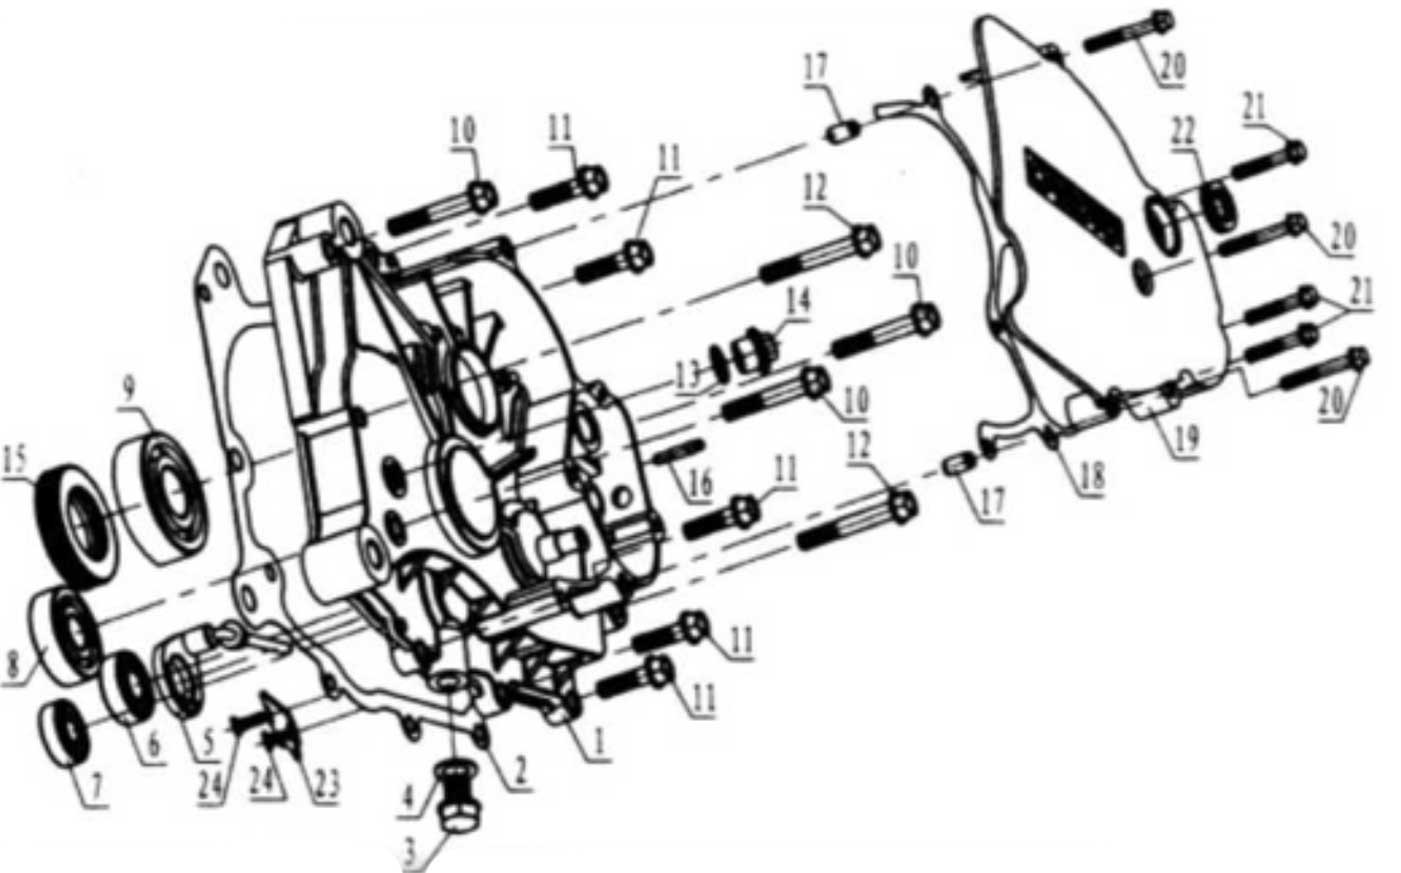 Hammerhead Go Kart Wiring Harness Cb350 Wire Diagram